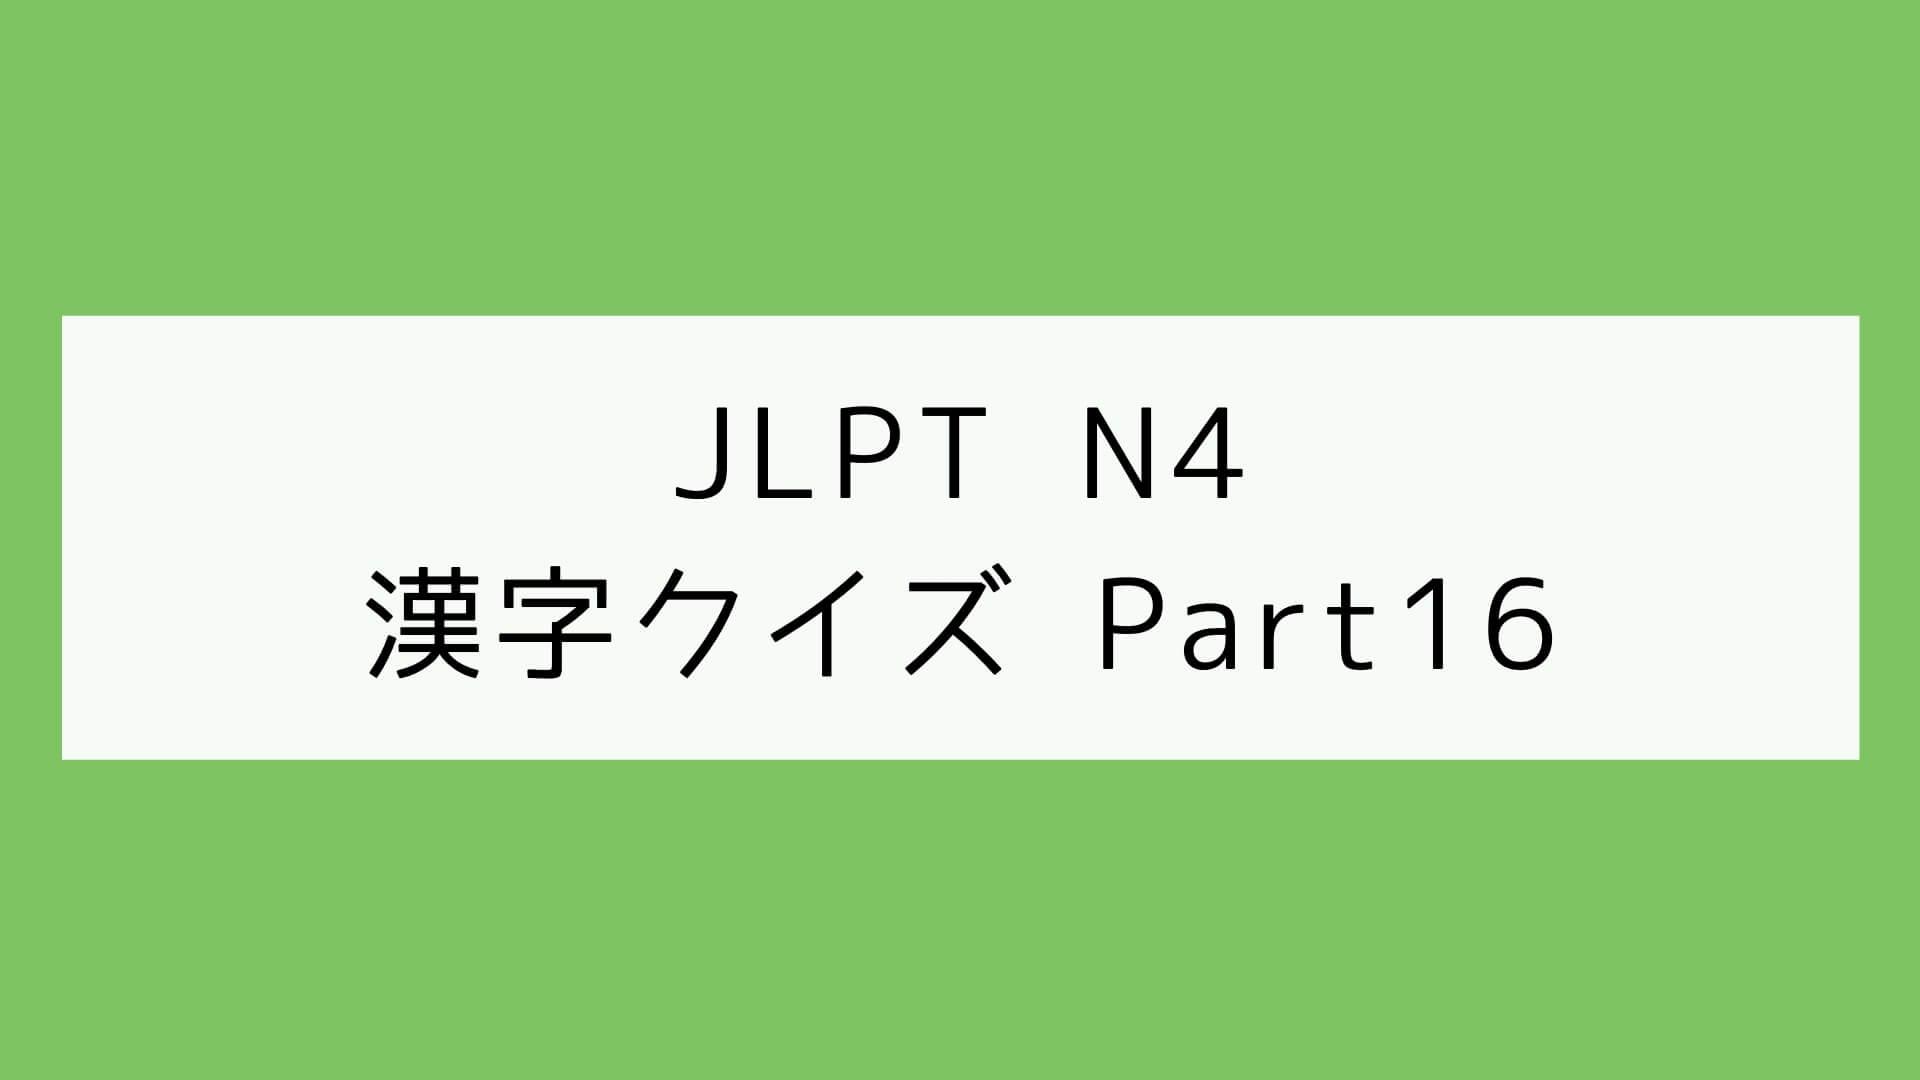 【JLPT N4】漢字クイズ Part16